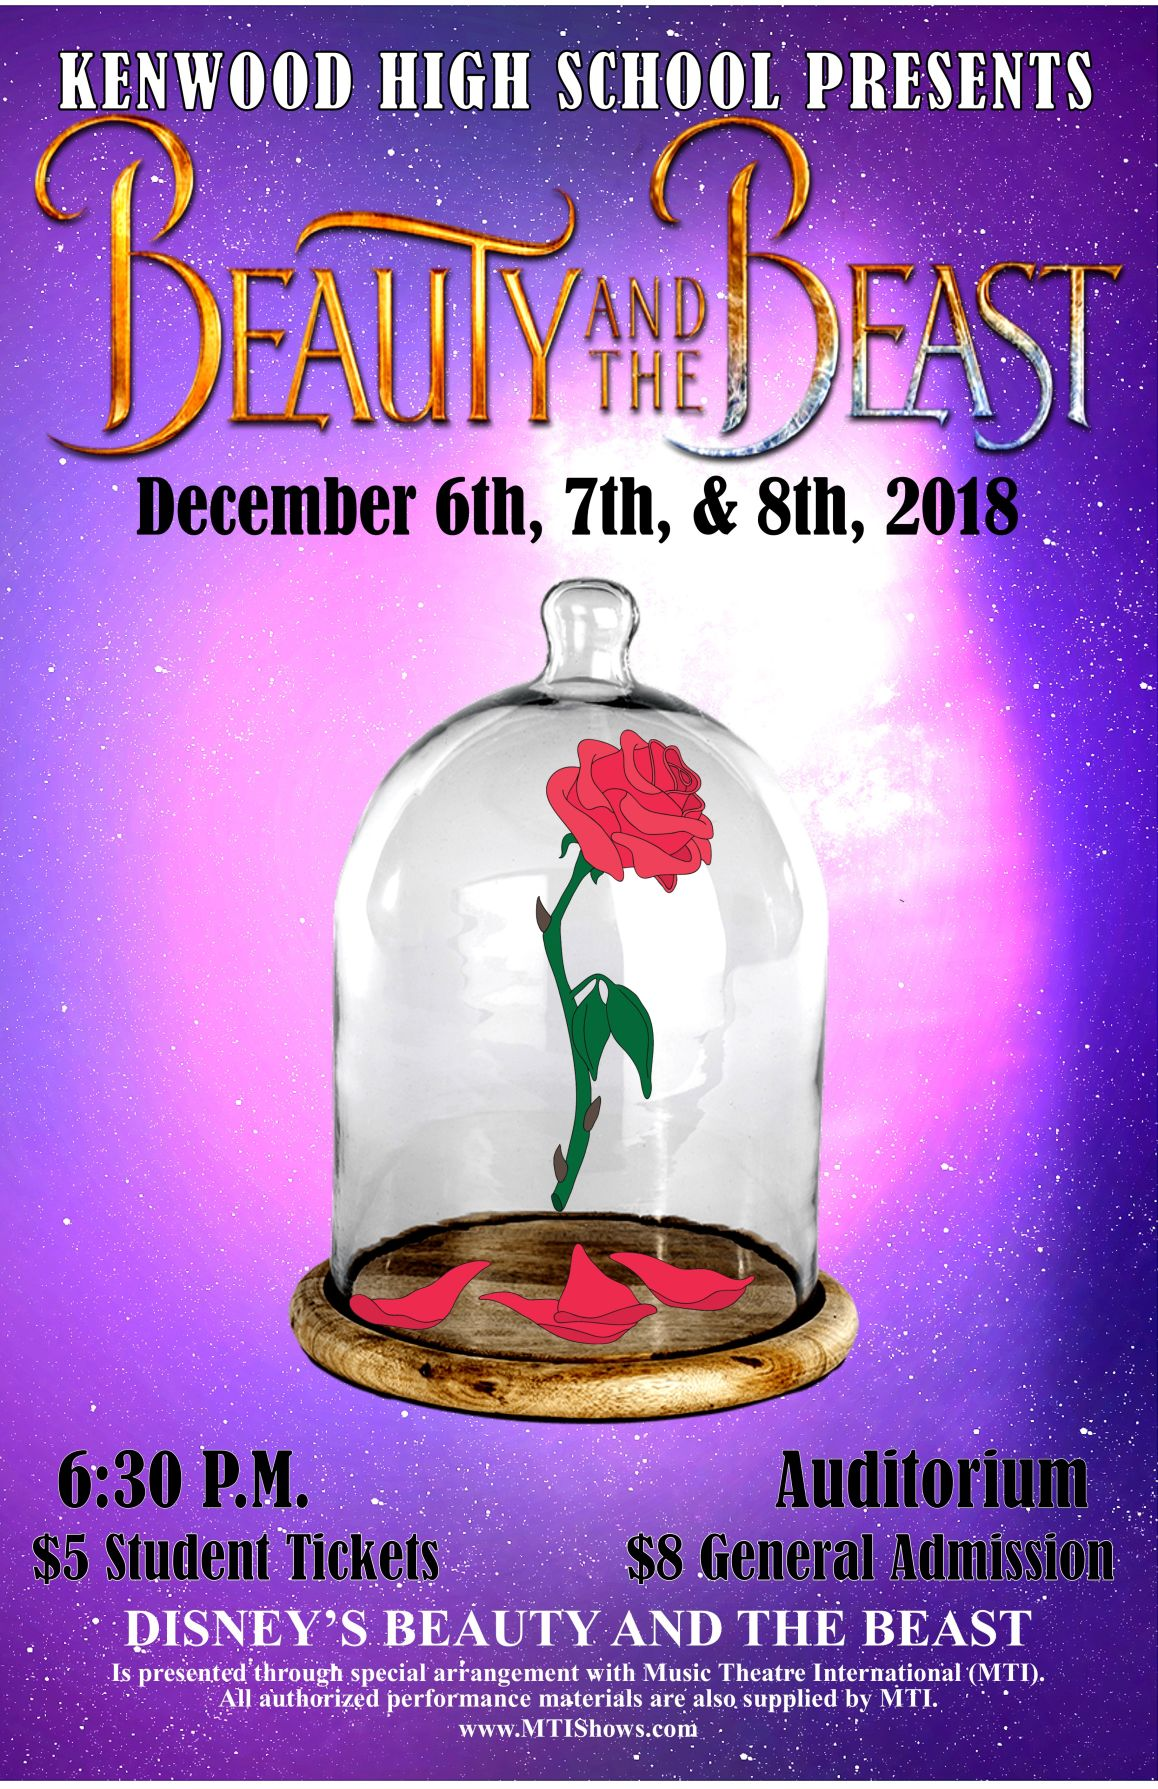 Kenwood HS Presents Beauty & the Beast